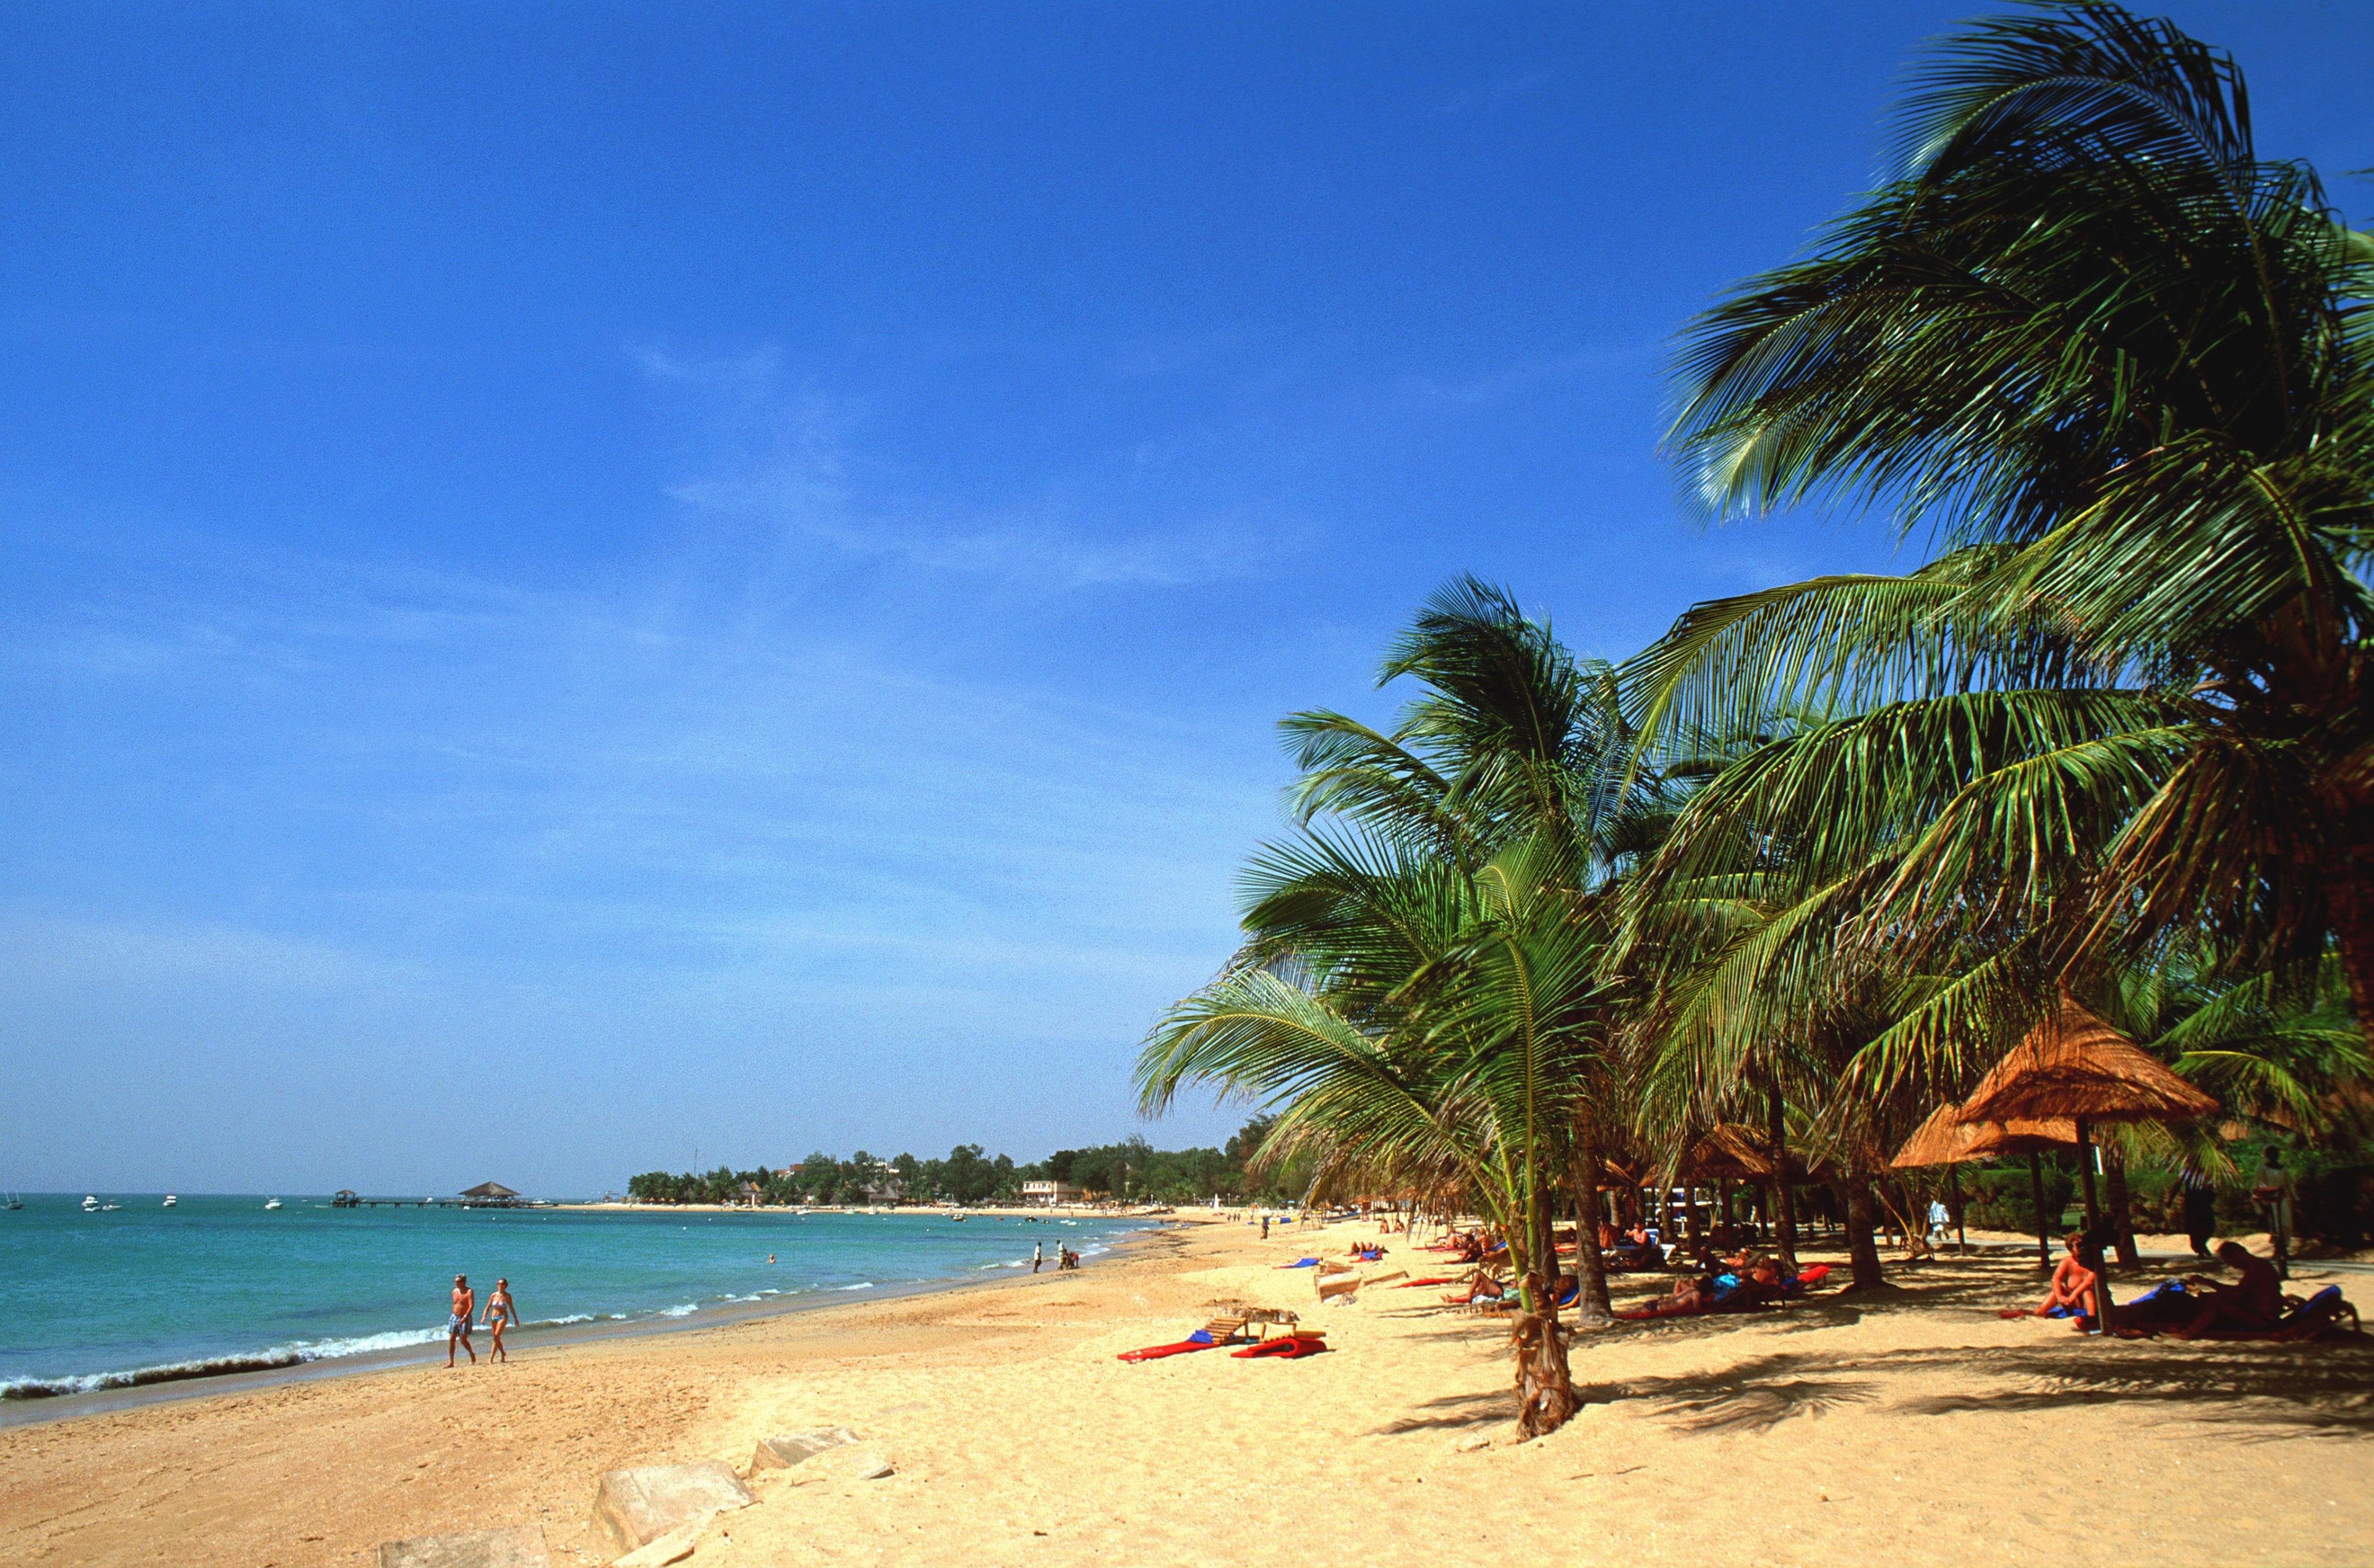 Saly, Mbour, Thiès Region, Senegal